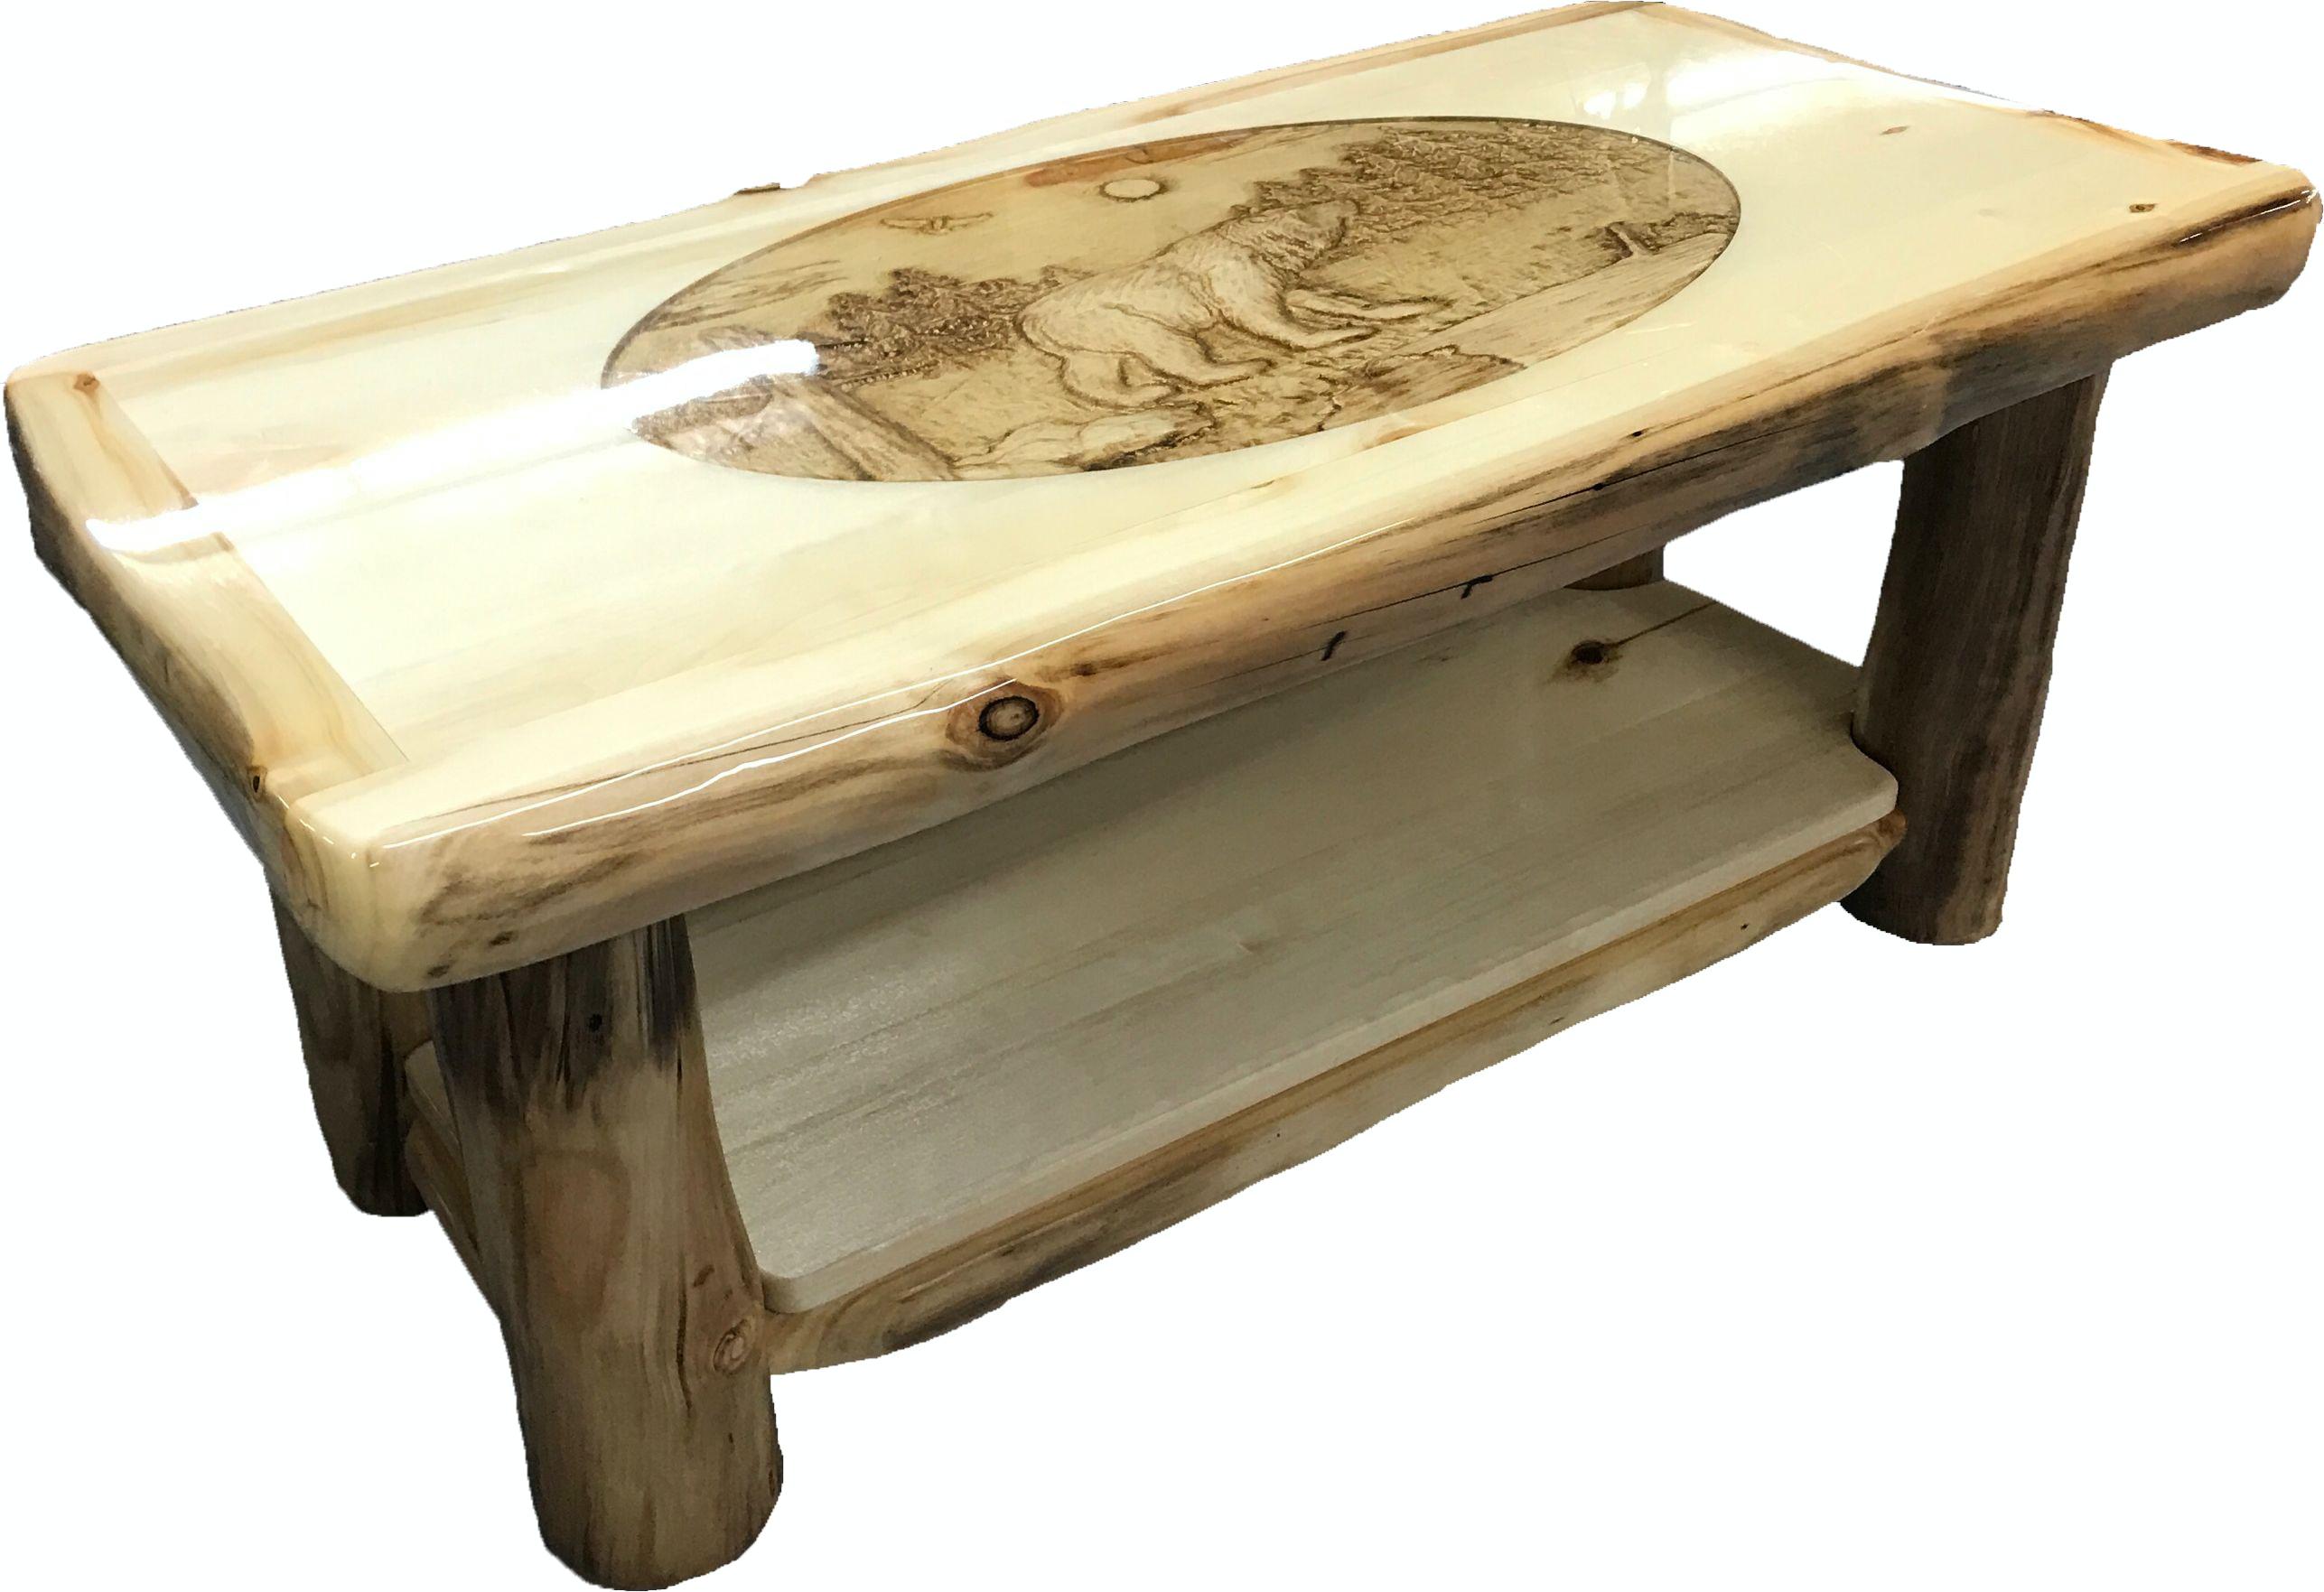 Ordinaire Rustic Log Furniture Coffee Table CTAB 42 NN SH RI Bear